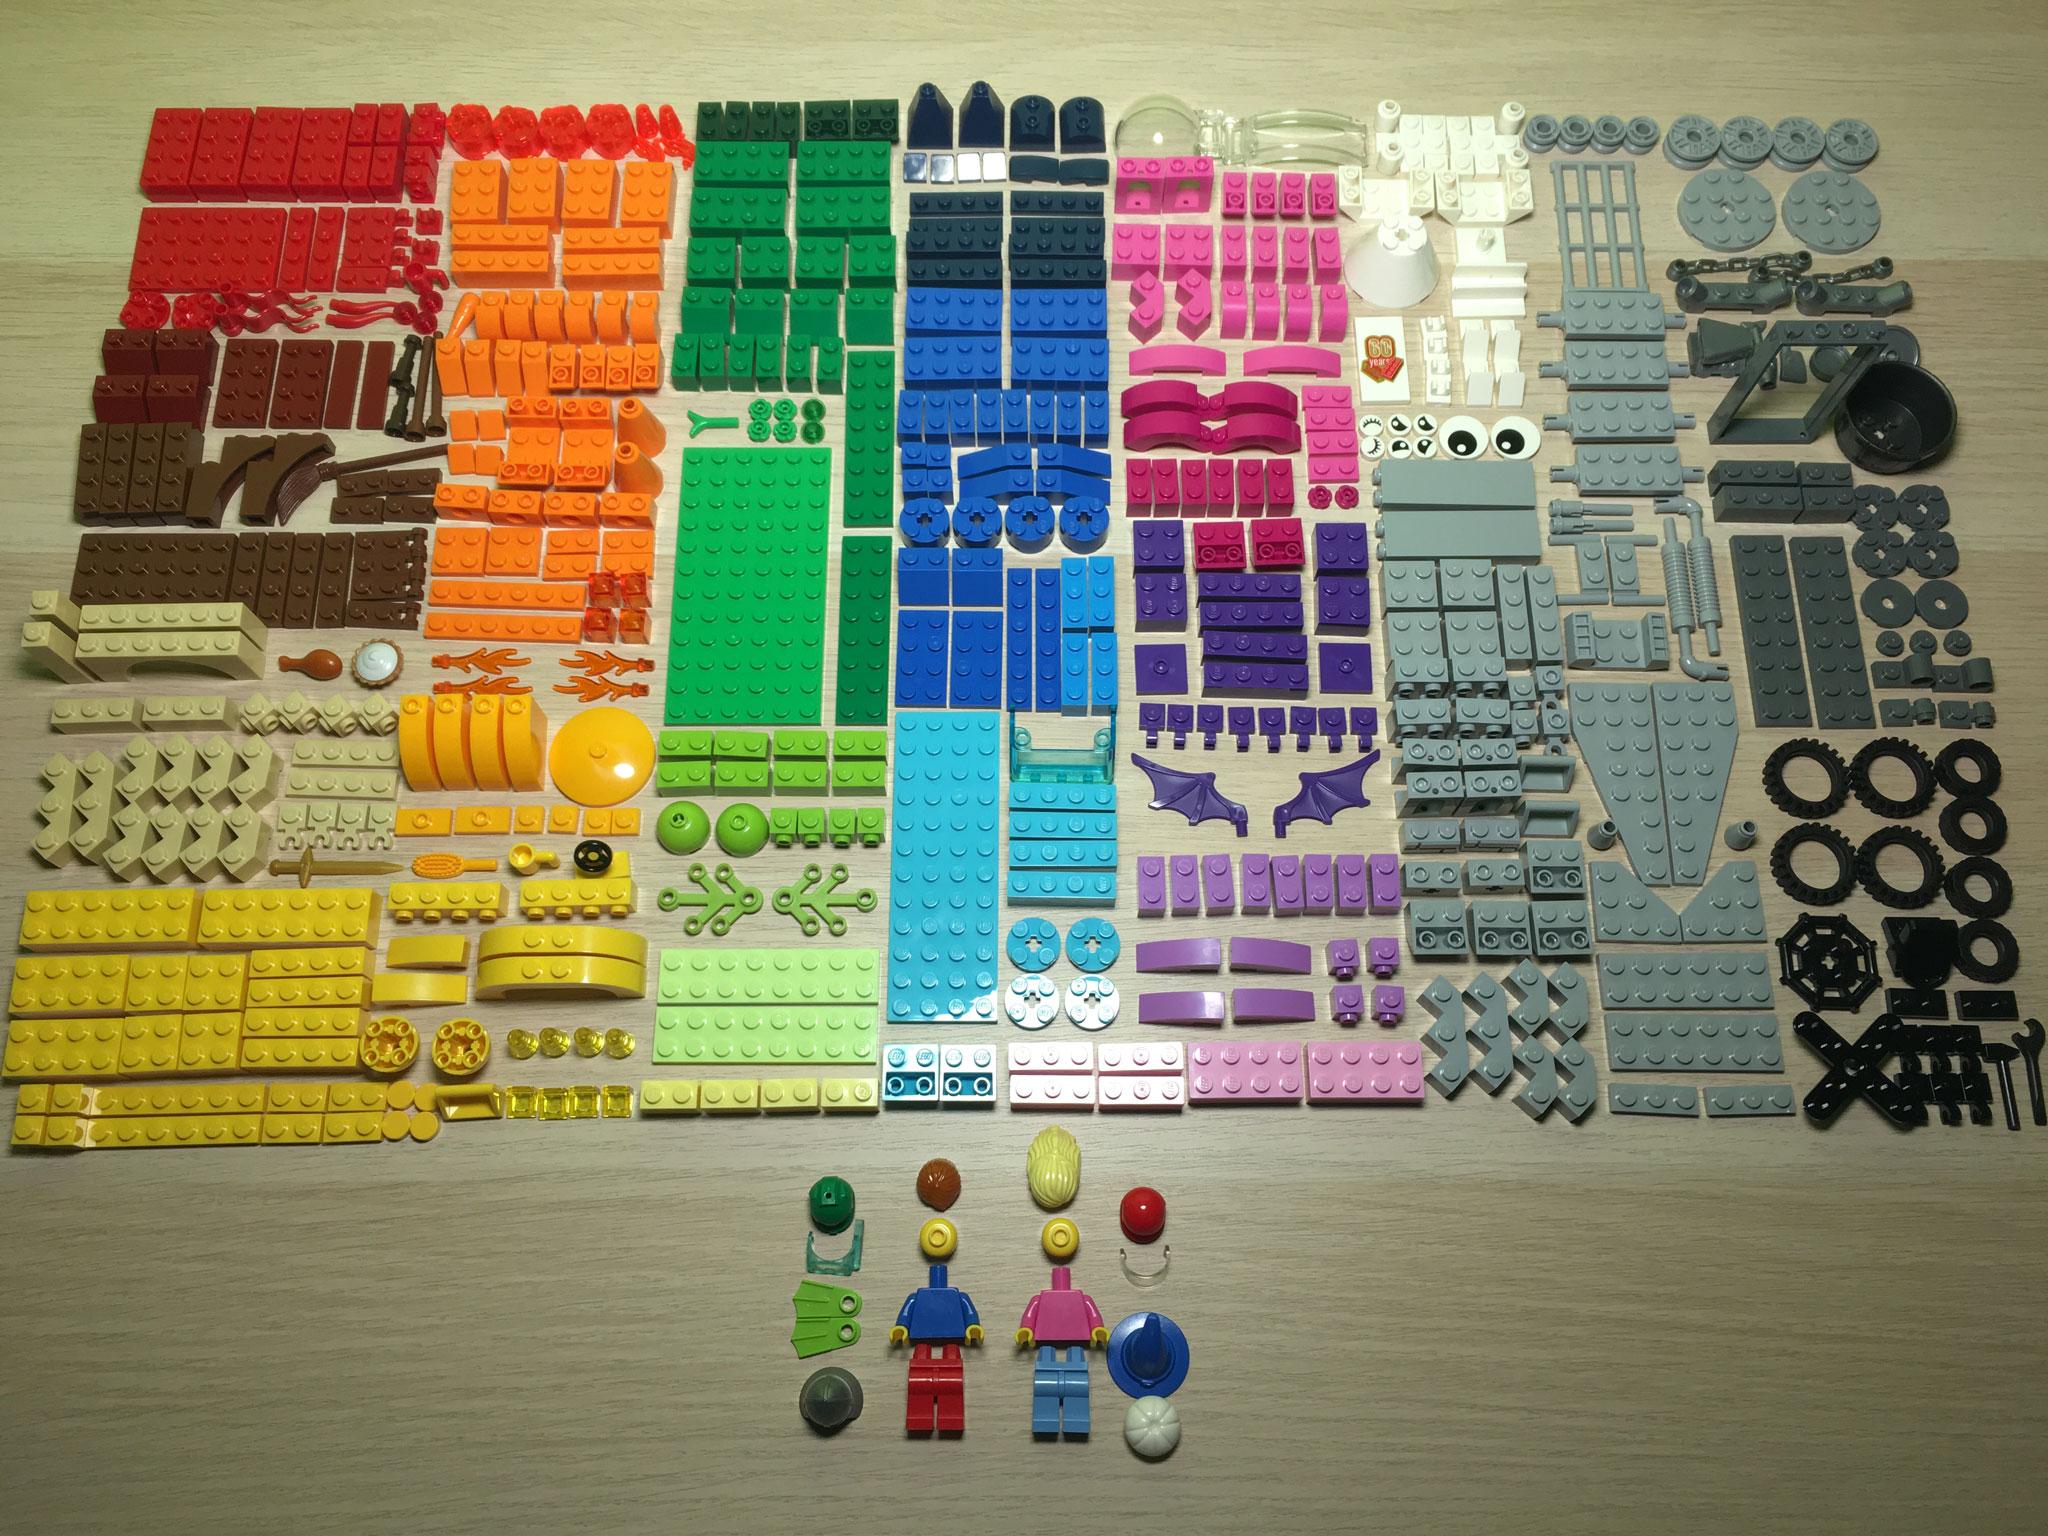 LEGO Set Review: 10404 Ocean's Bottom • NOVALISTIC